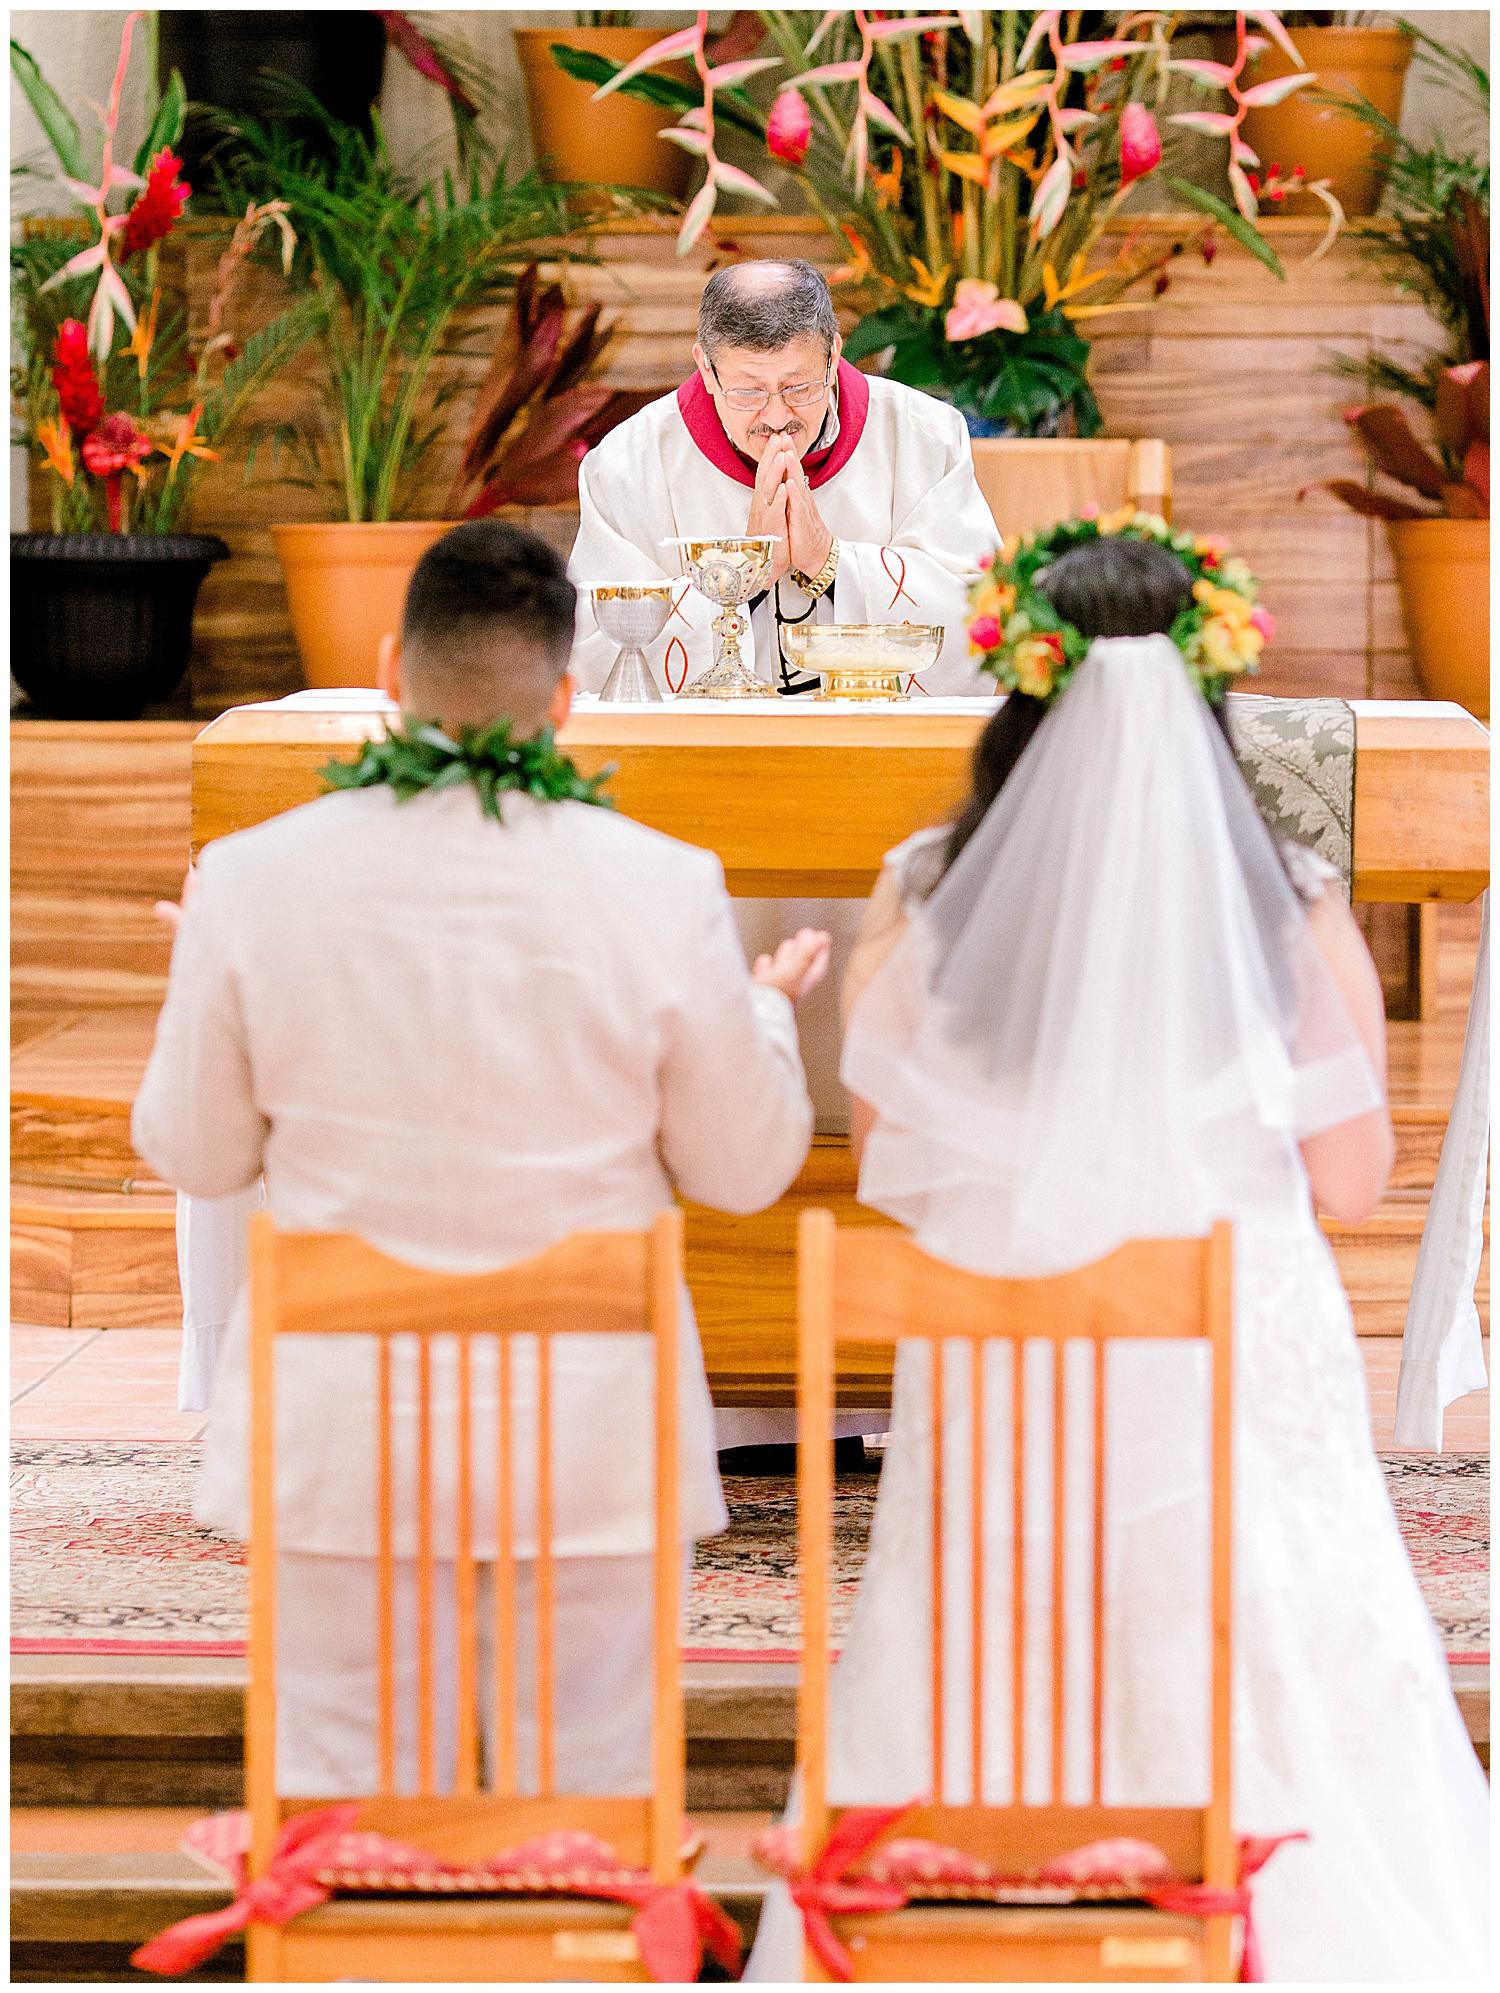 Maui-Wedding-Ceremony-St-Theresa-Church-Kihei_0019.jpg